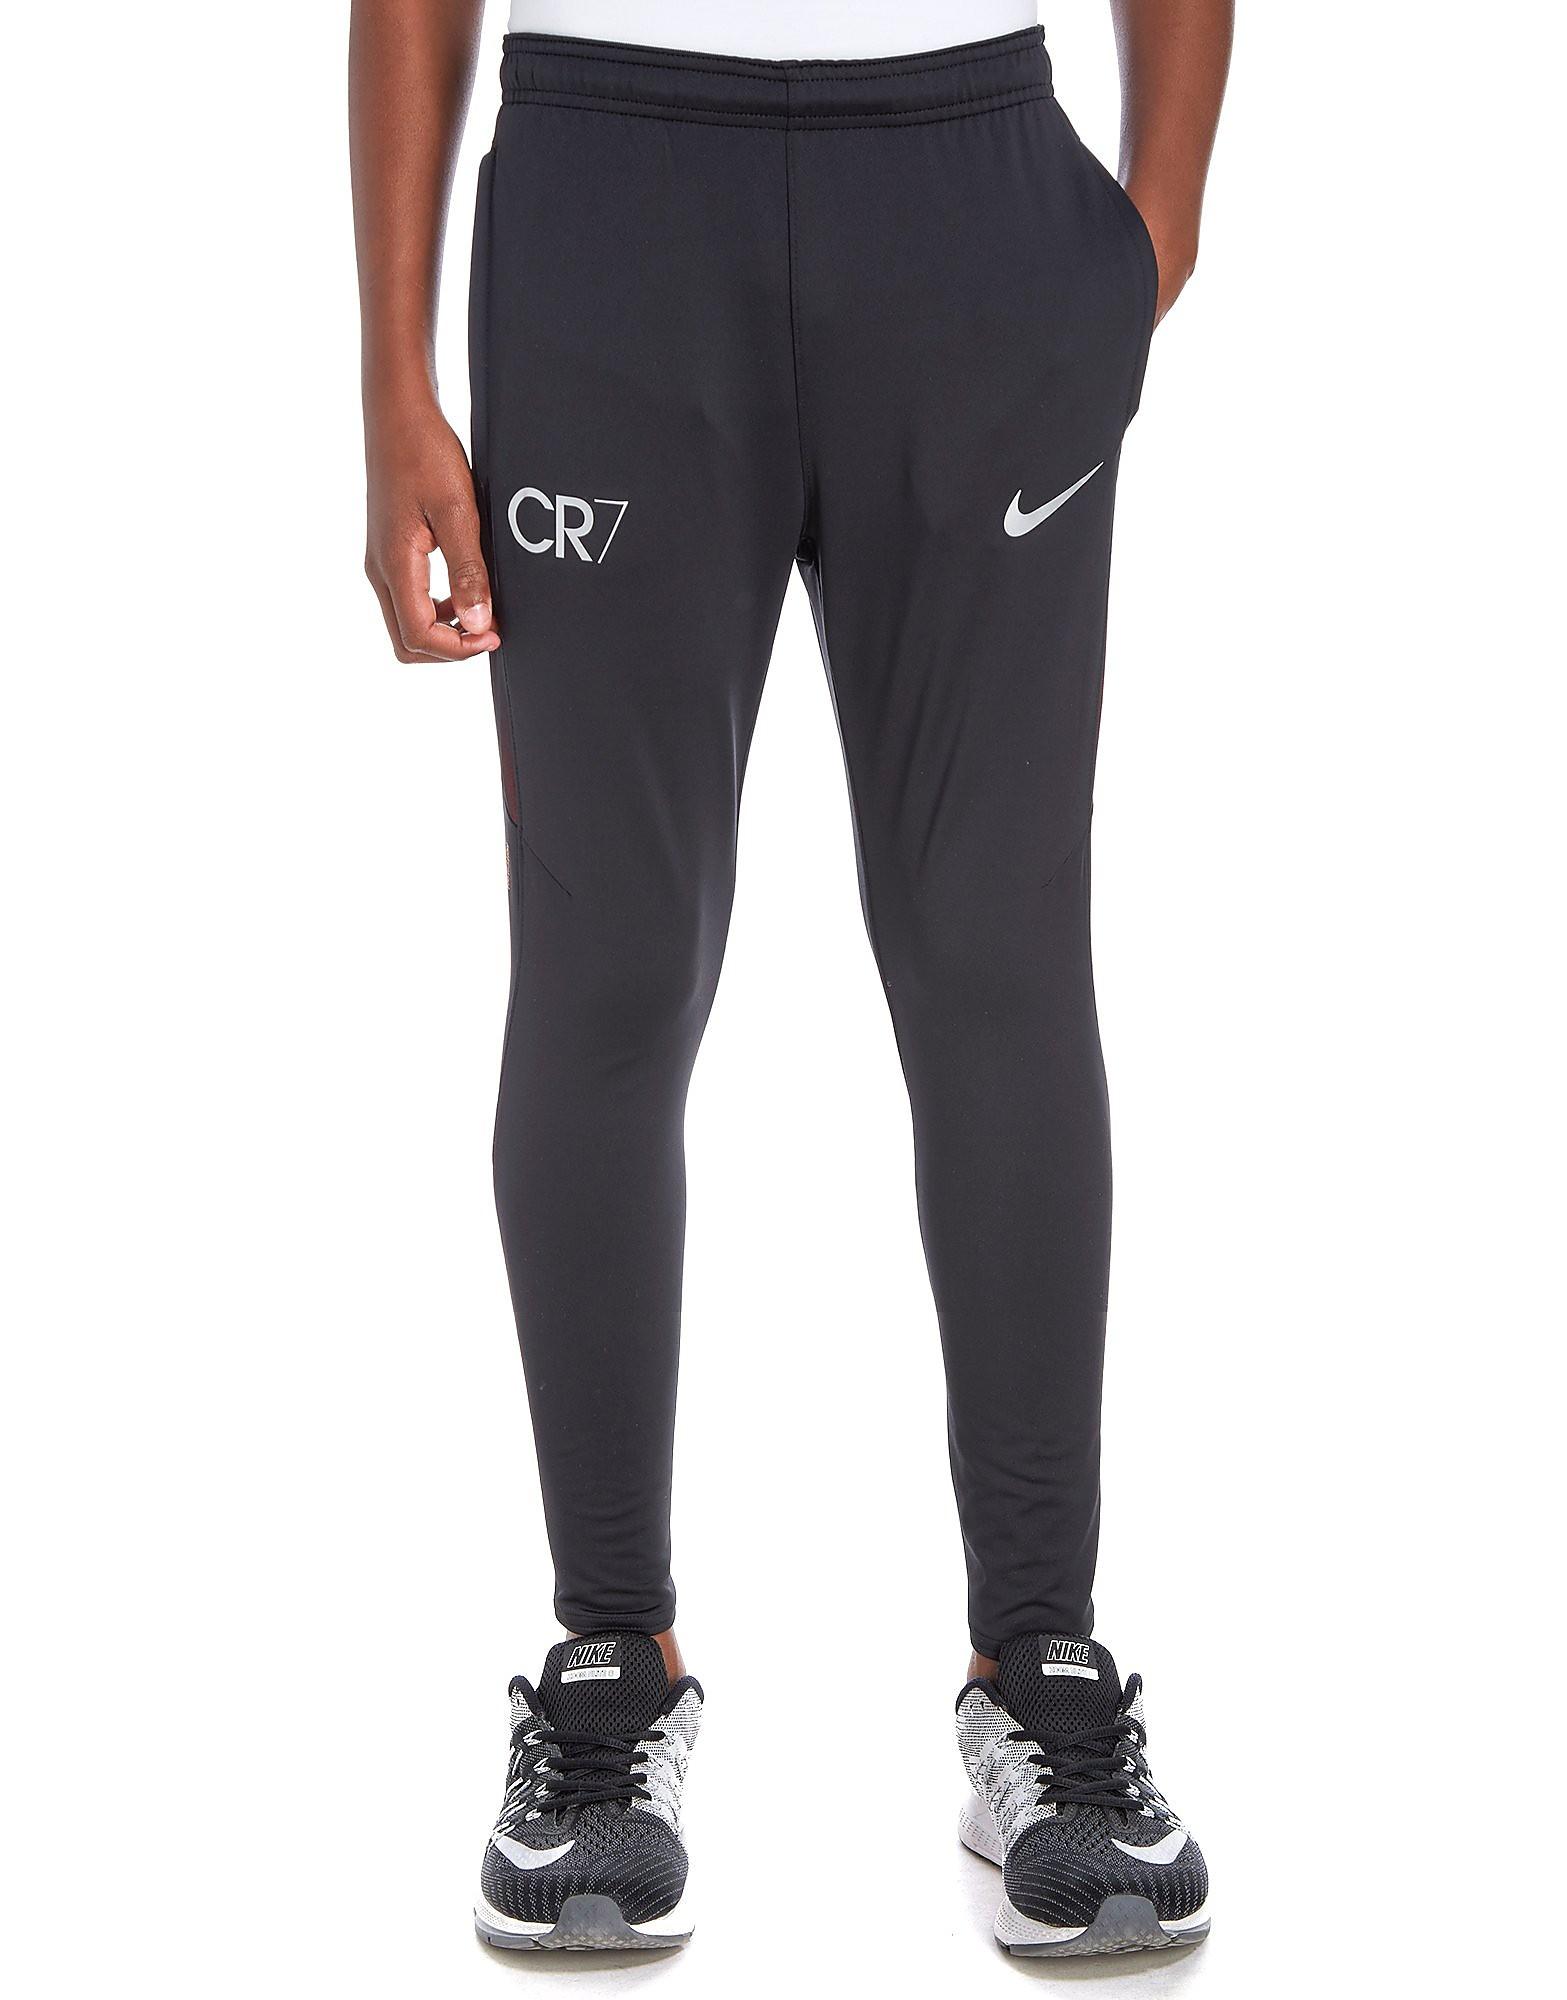 Nike Squad CR7 Traningsbroek Junior